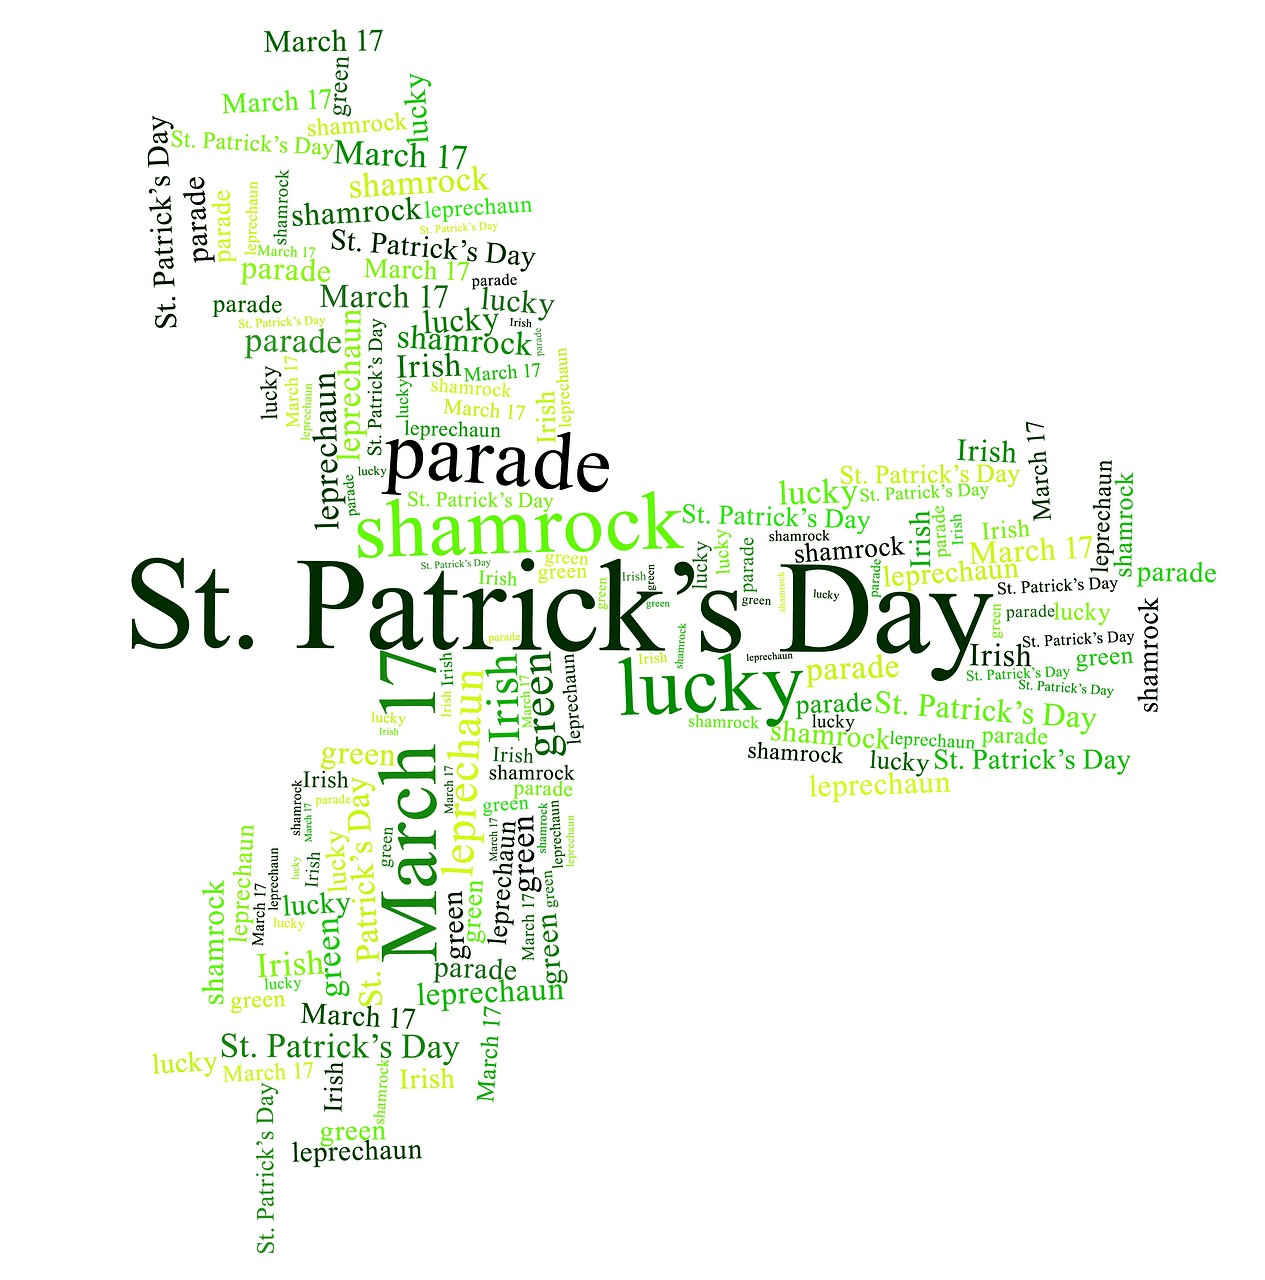 St. Patrick's Day | luxury Irish tour operators